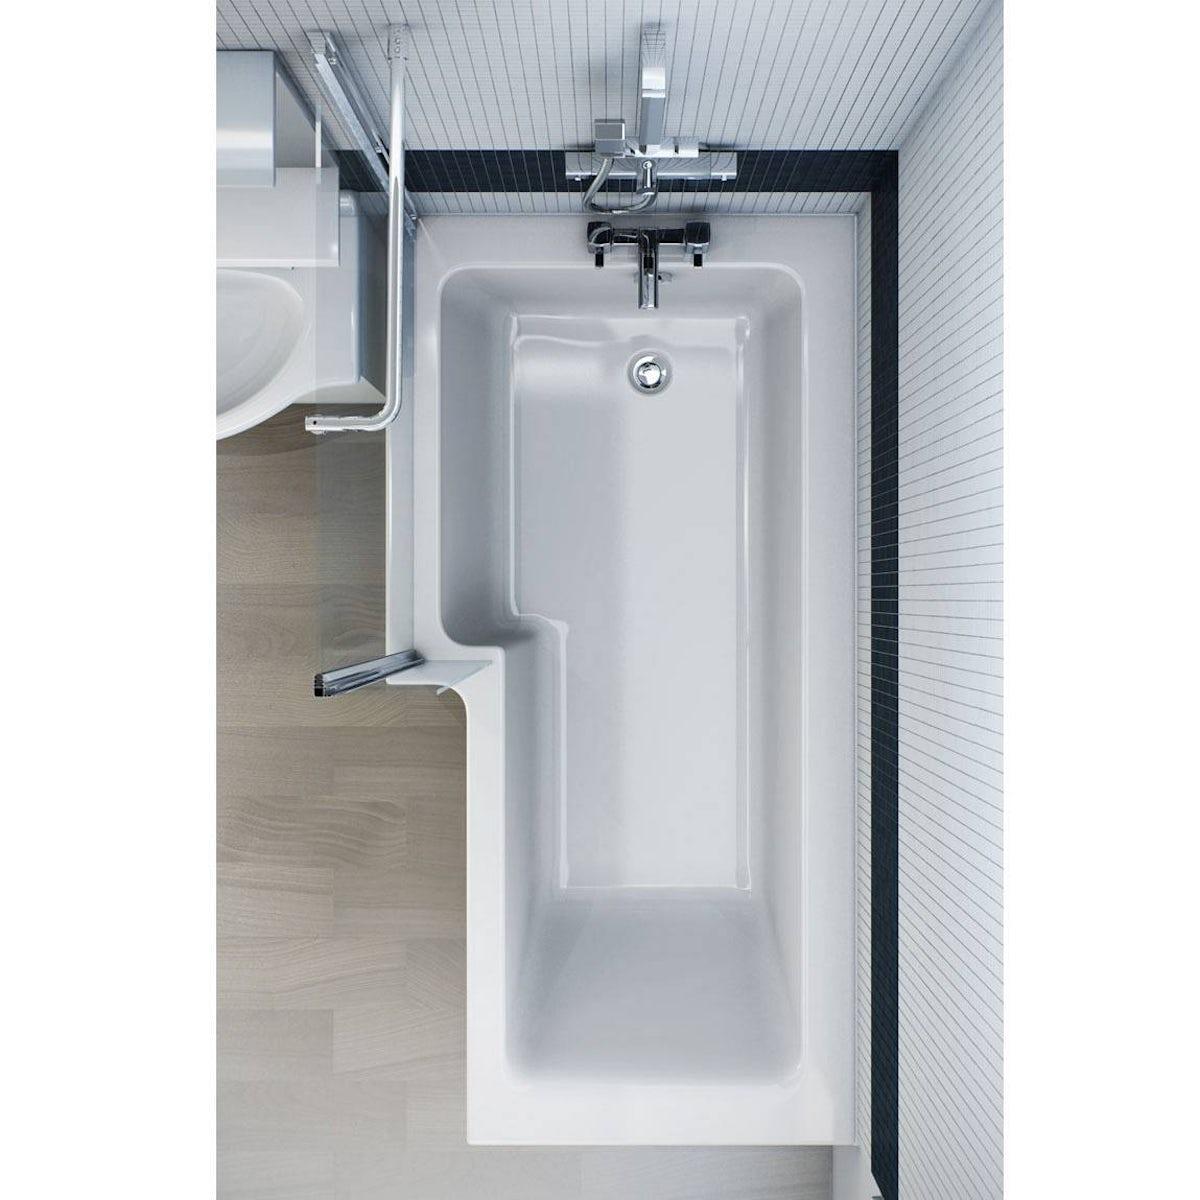 orchard l shaped left handed shower bath 1700mm with 6mm shower boston shower bath 1700 x 850 lh inc screen towel rail